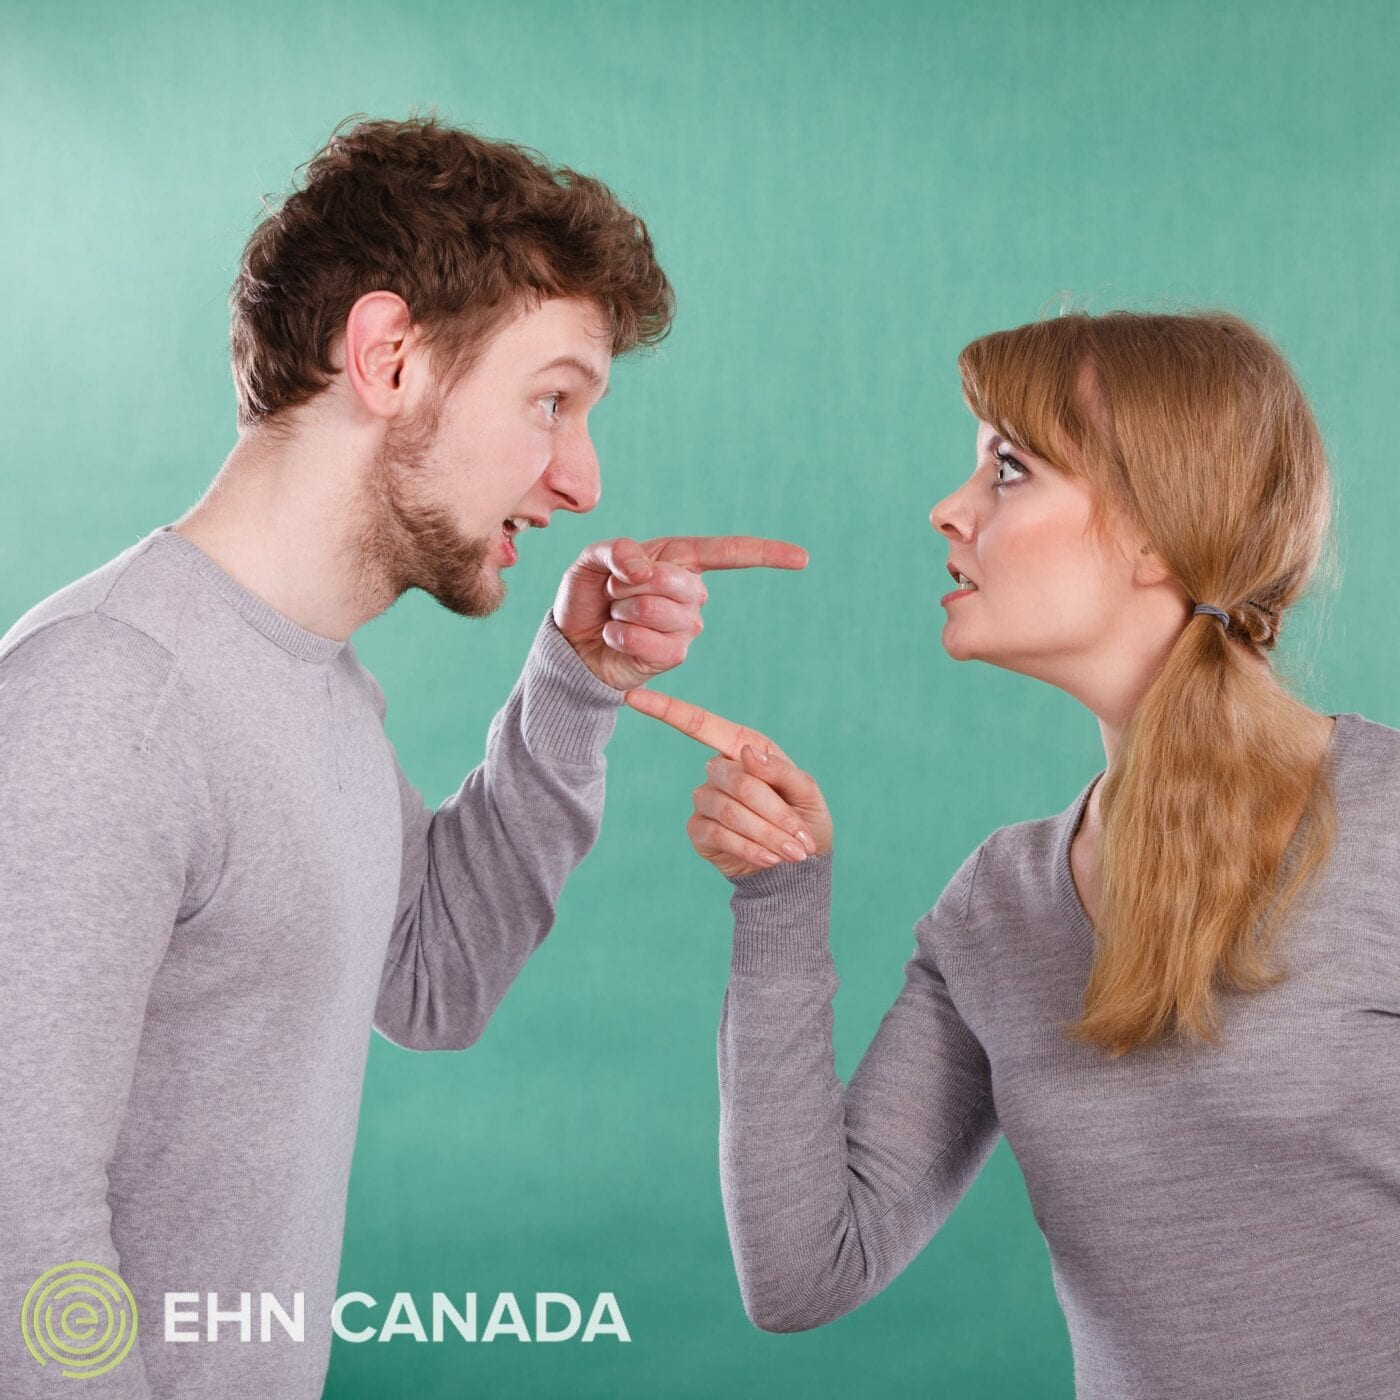 Confronting conflict during coronavirus